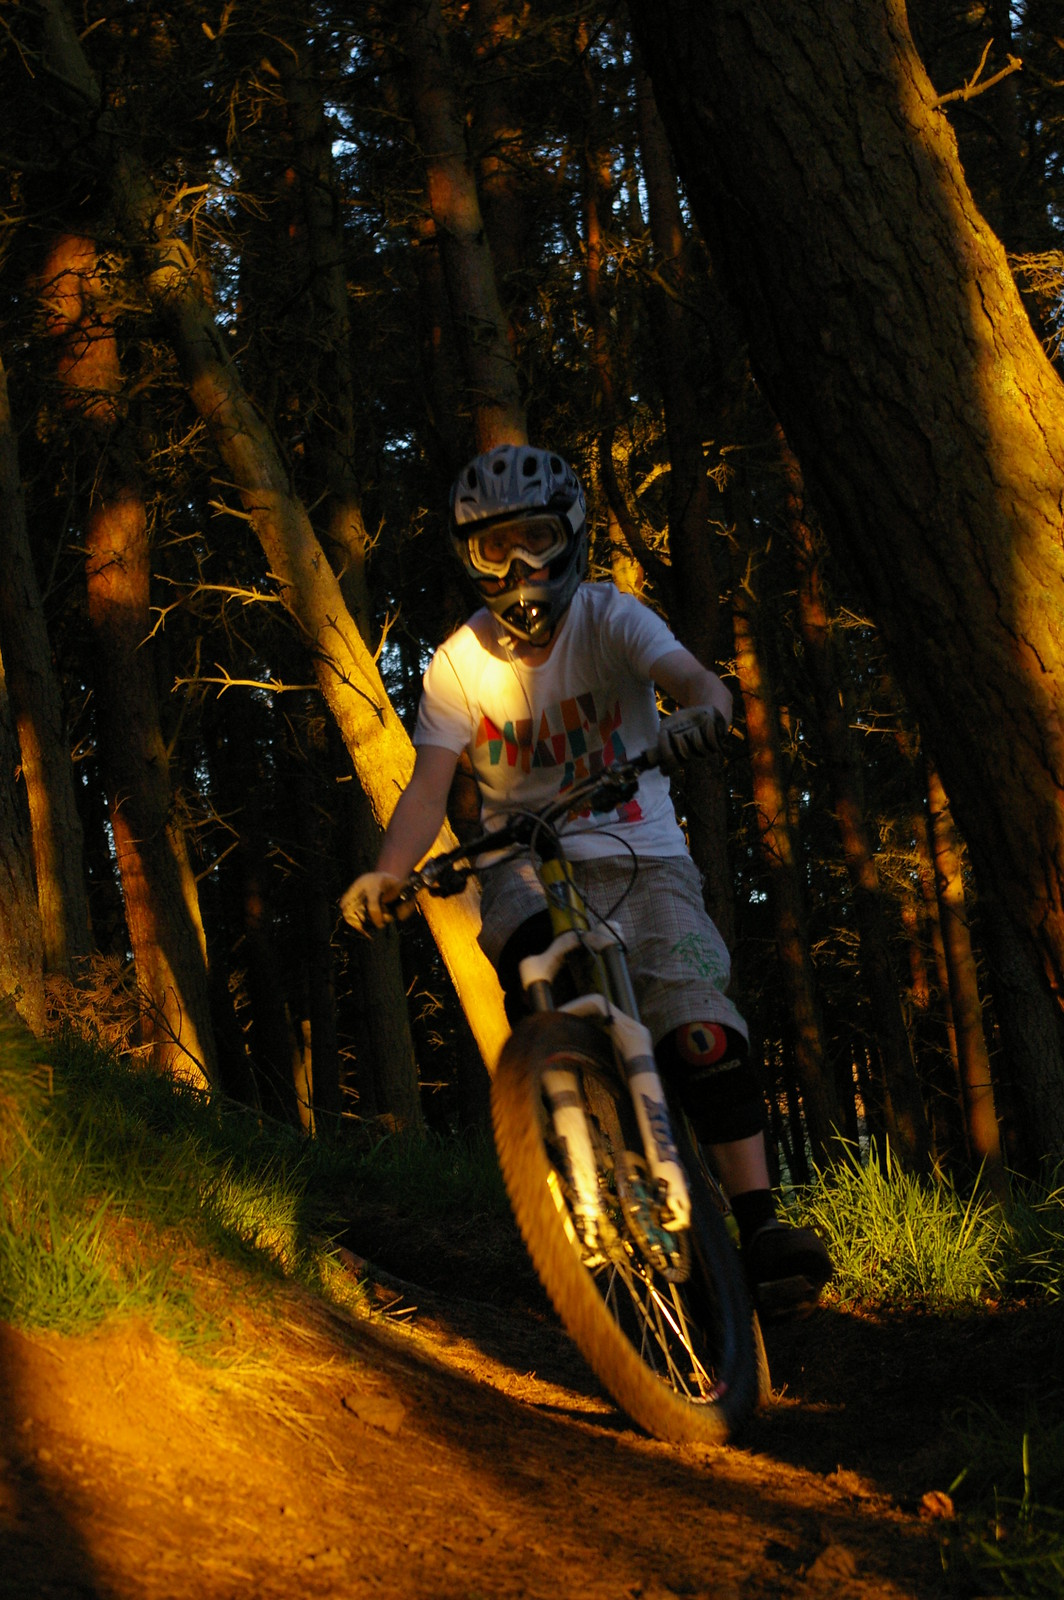 Bonaly - domino0 - Mountain Biking Pictures - Vital MTB